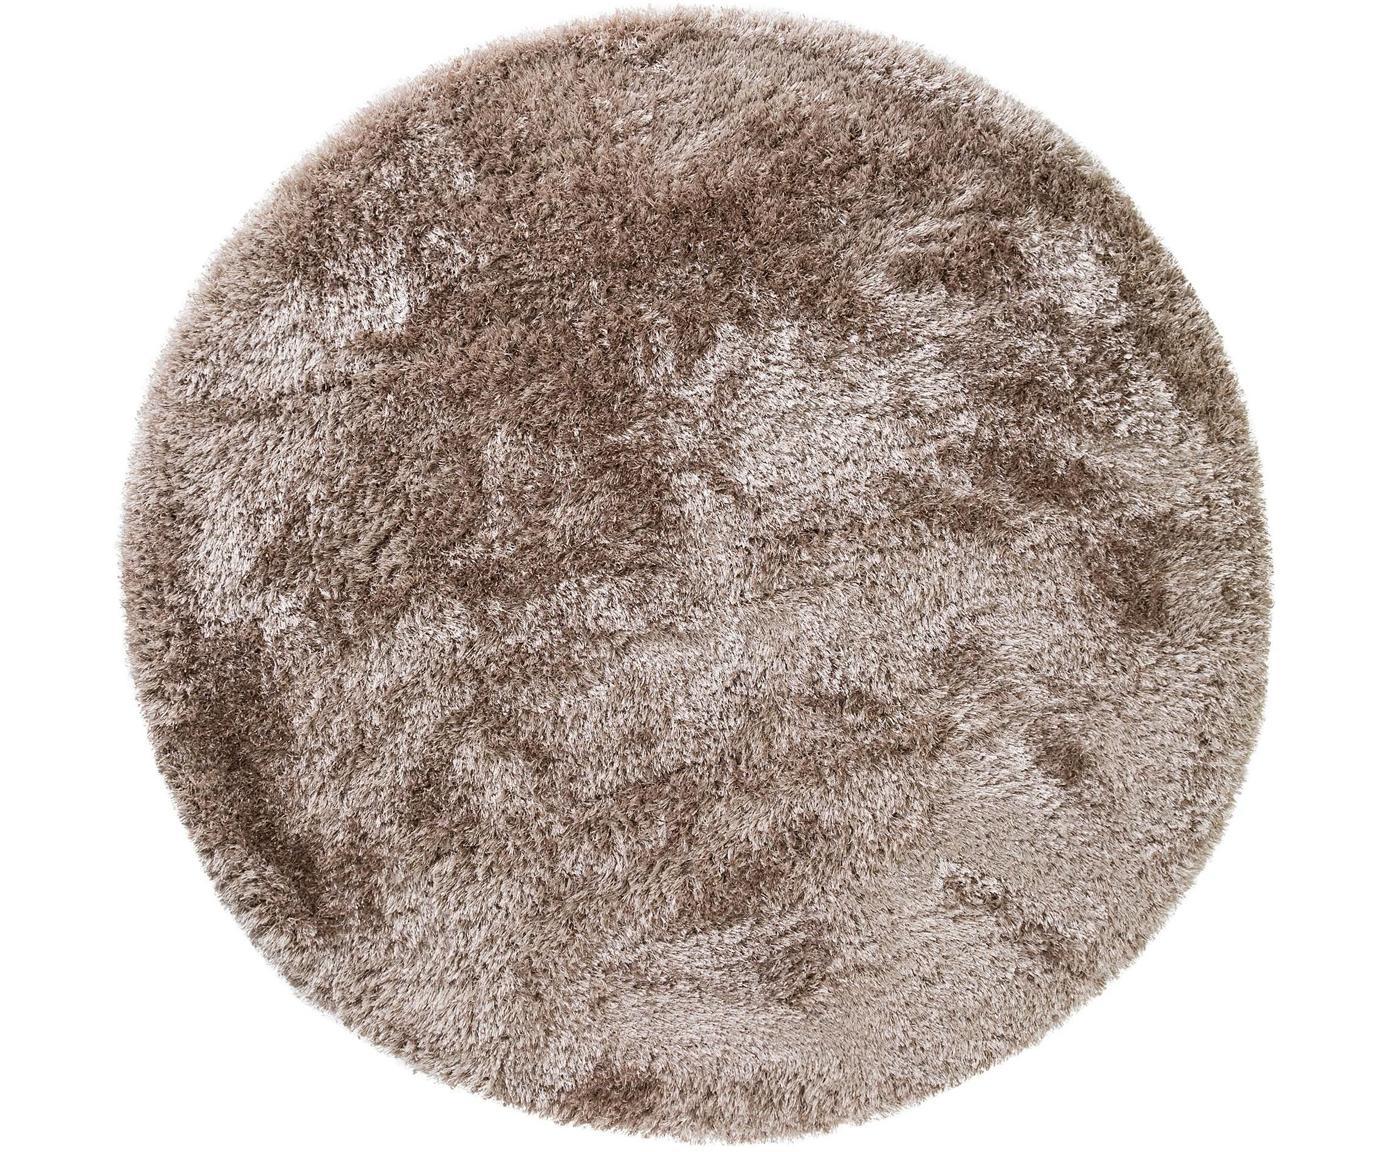 Alfombra redonda de pelo largo Lea, 50%poliéster, 50%polipropileno, Beige, Ø 120 cm (Tamaño S)